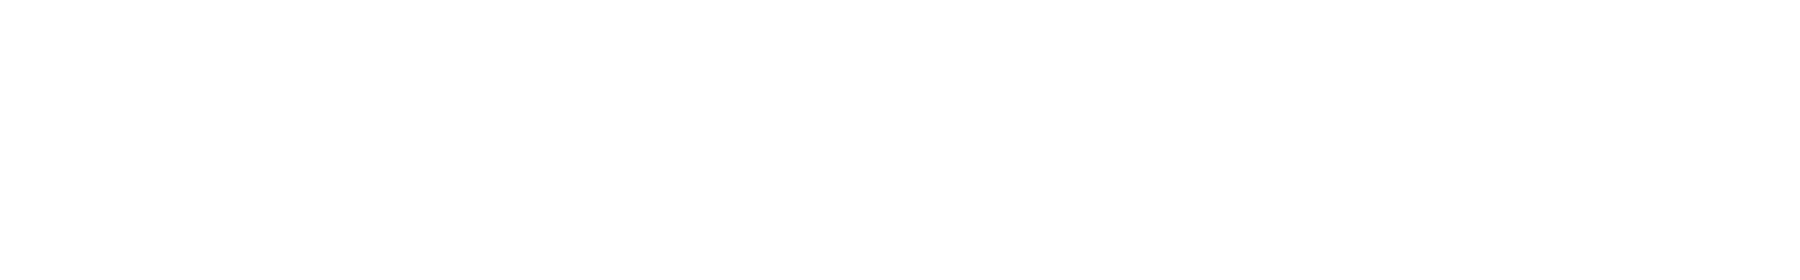 vedh bass cut 127 g